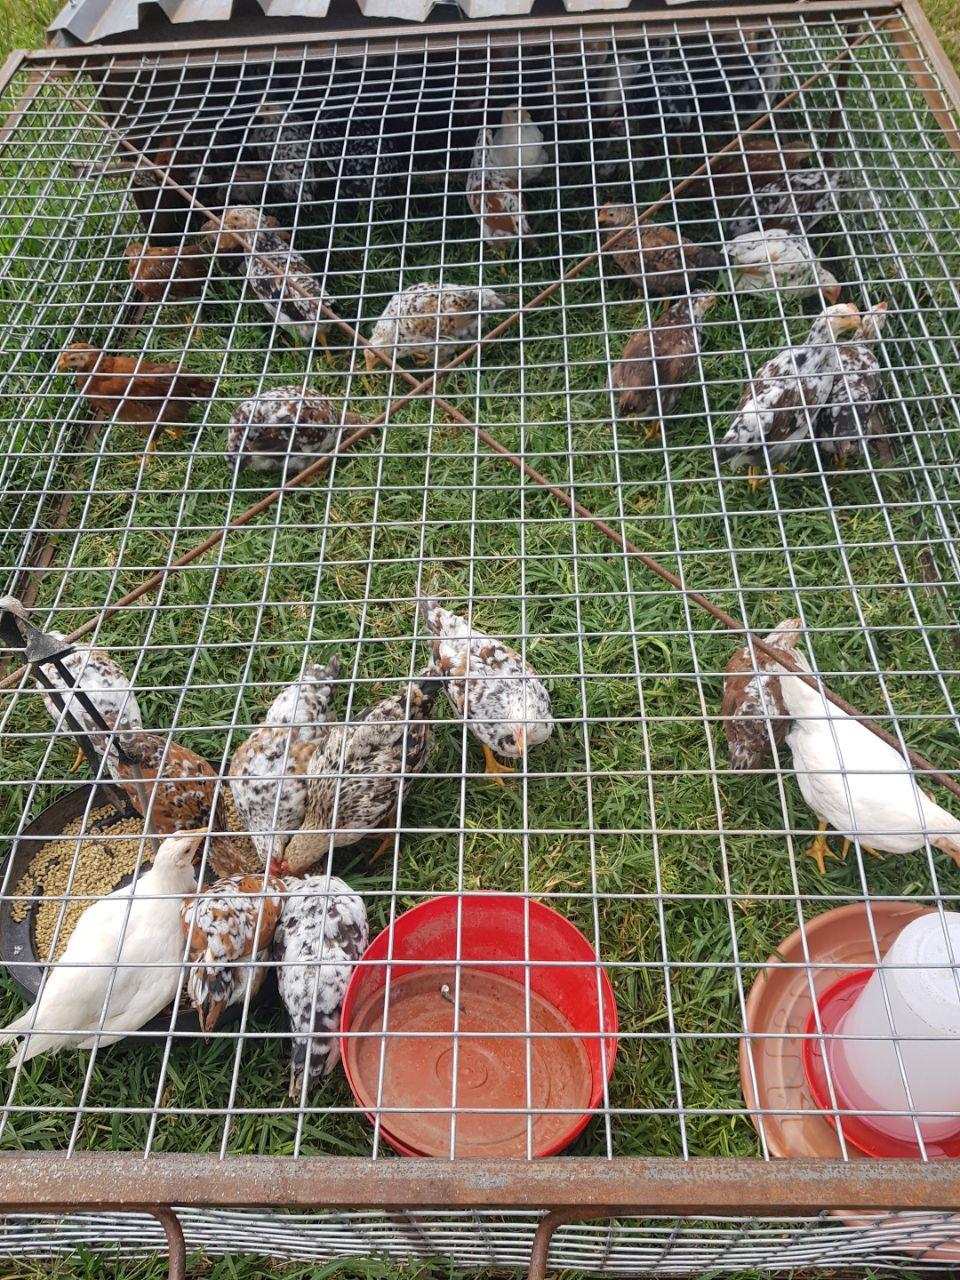 Jezreel Chickens